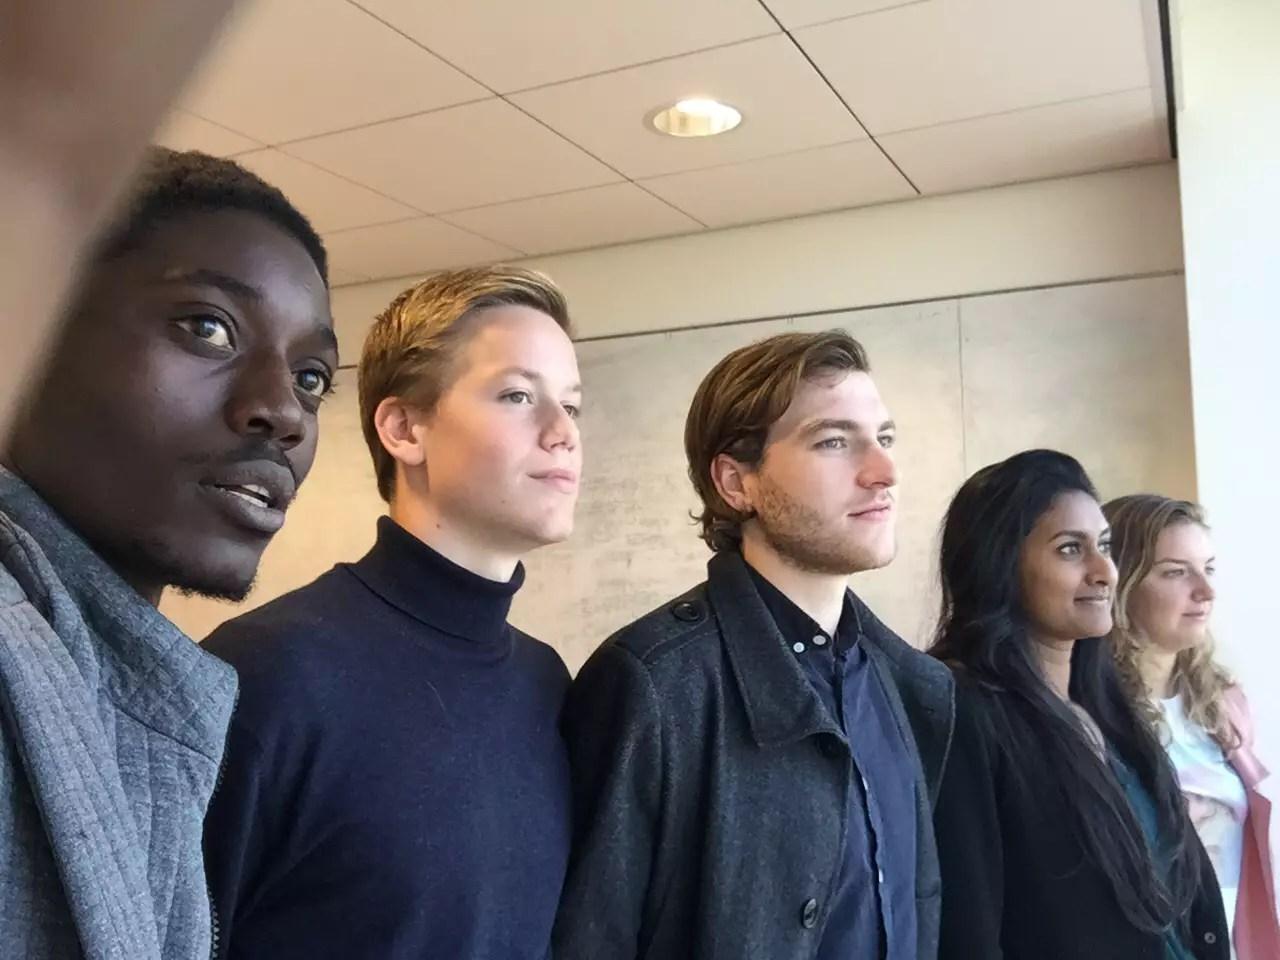 researchers Distribution team